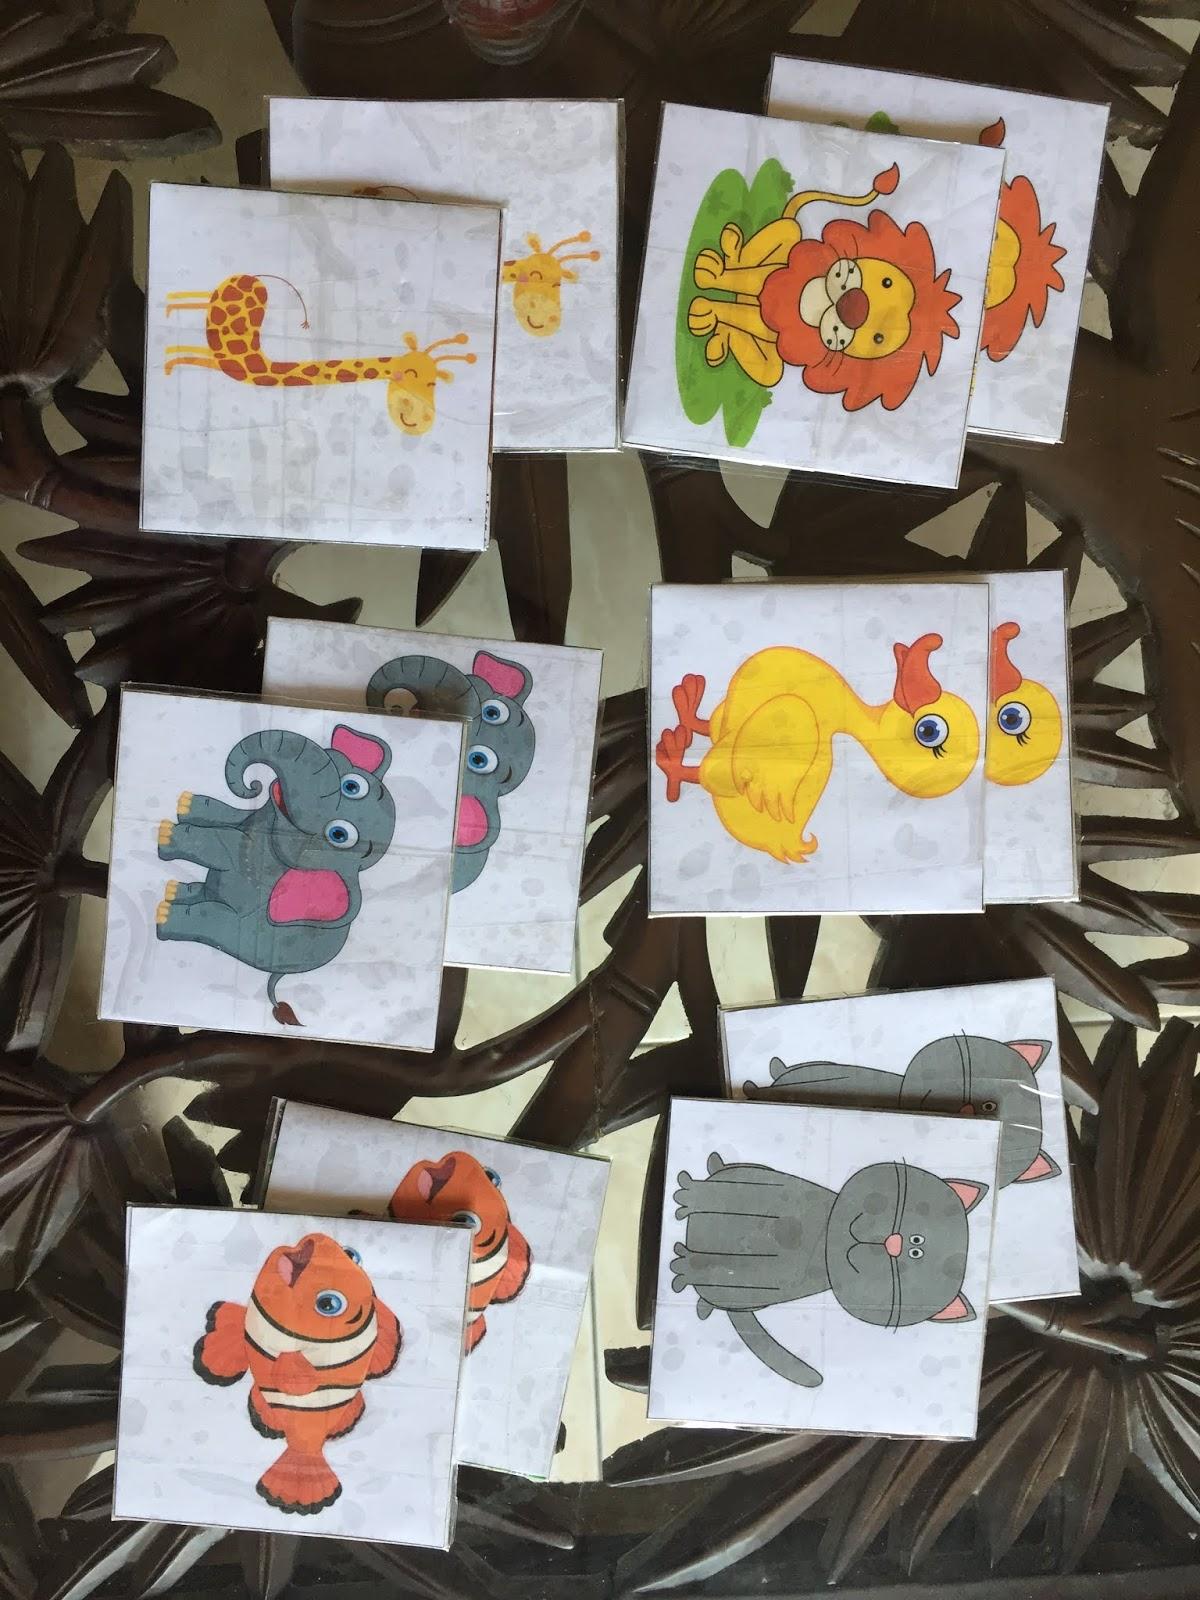 Gambar Kartun Sujud Di Kaki Ibu Aliansi Kartun